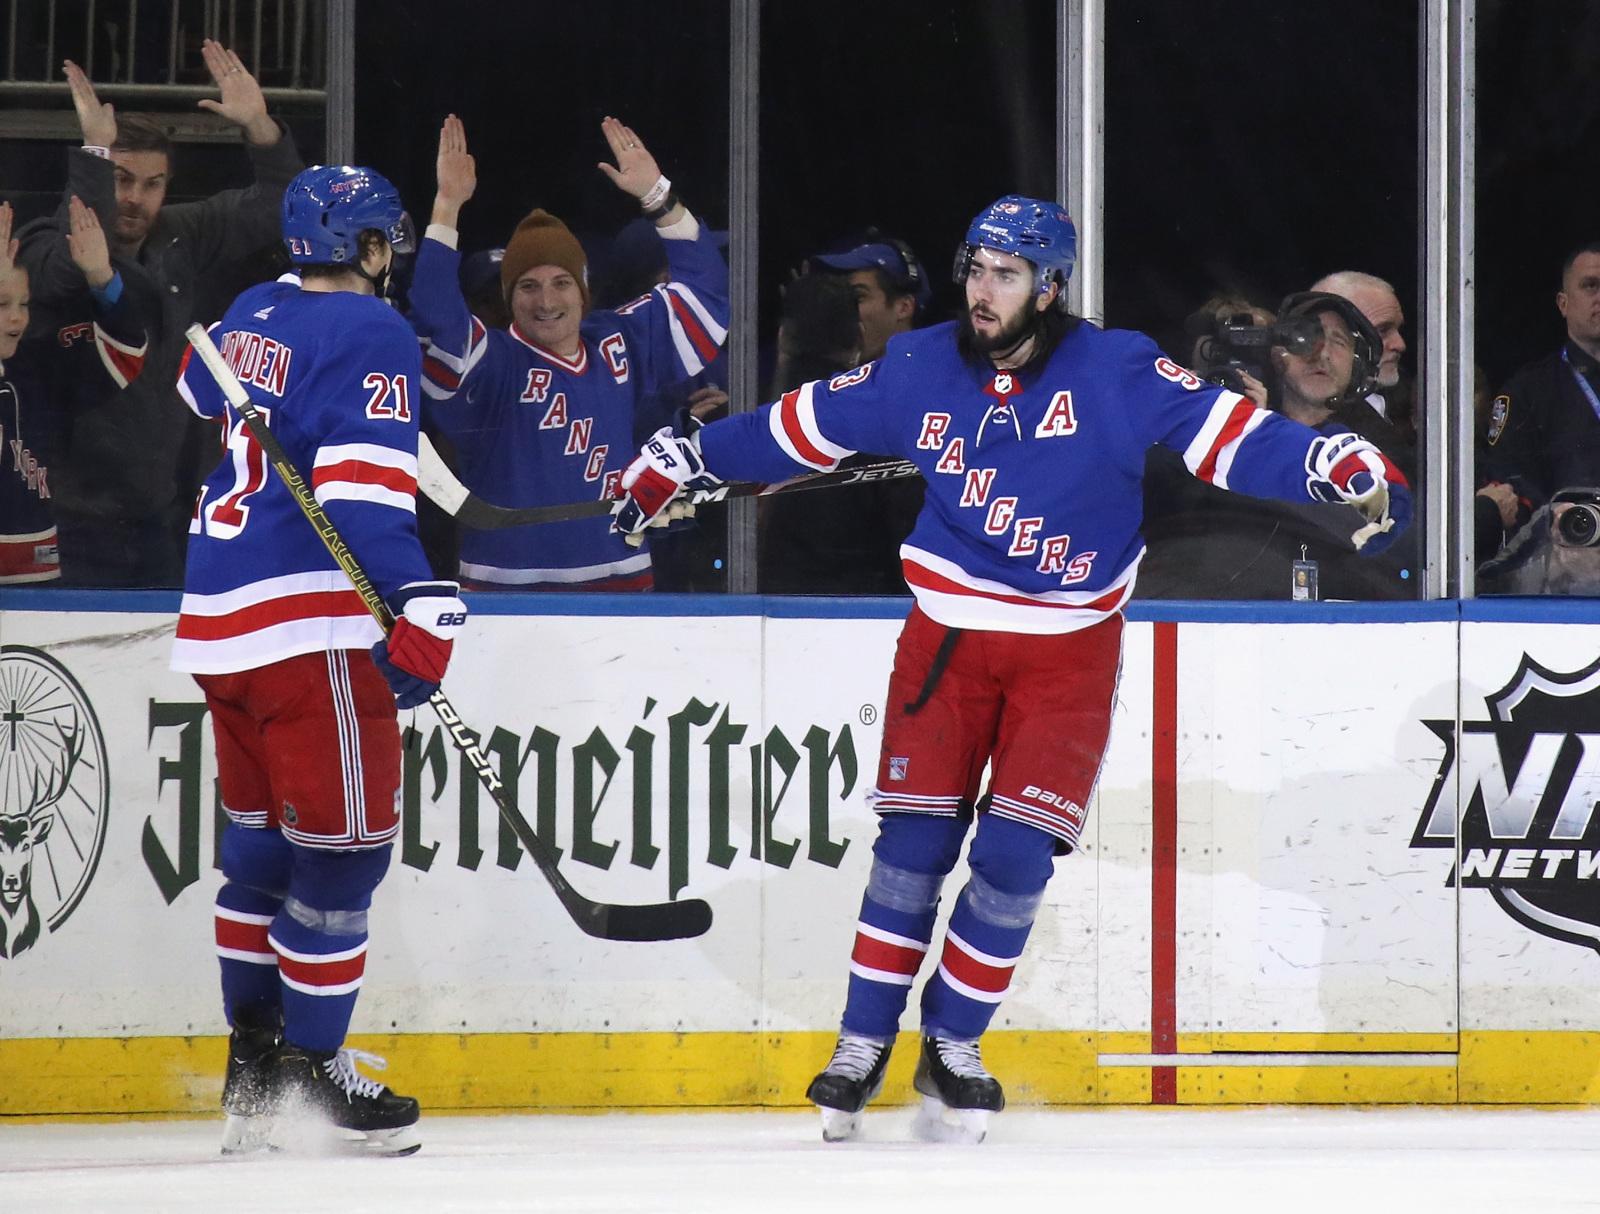 NHL 20 Simulation: Mika Zibanejad snaps Flyers streak with overtime winner